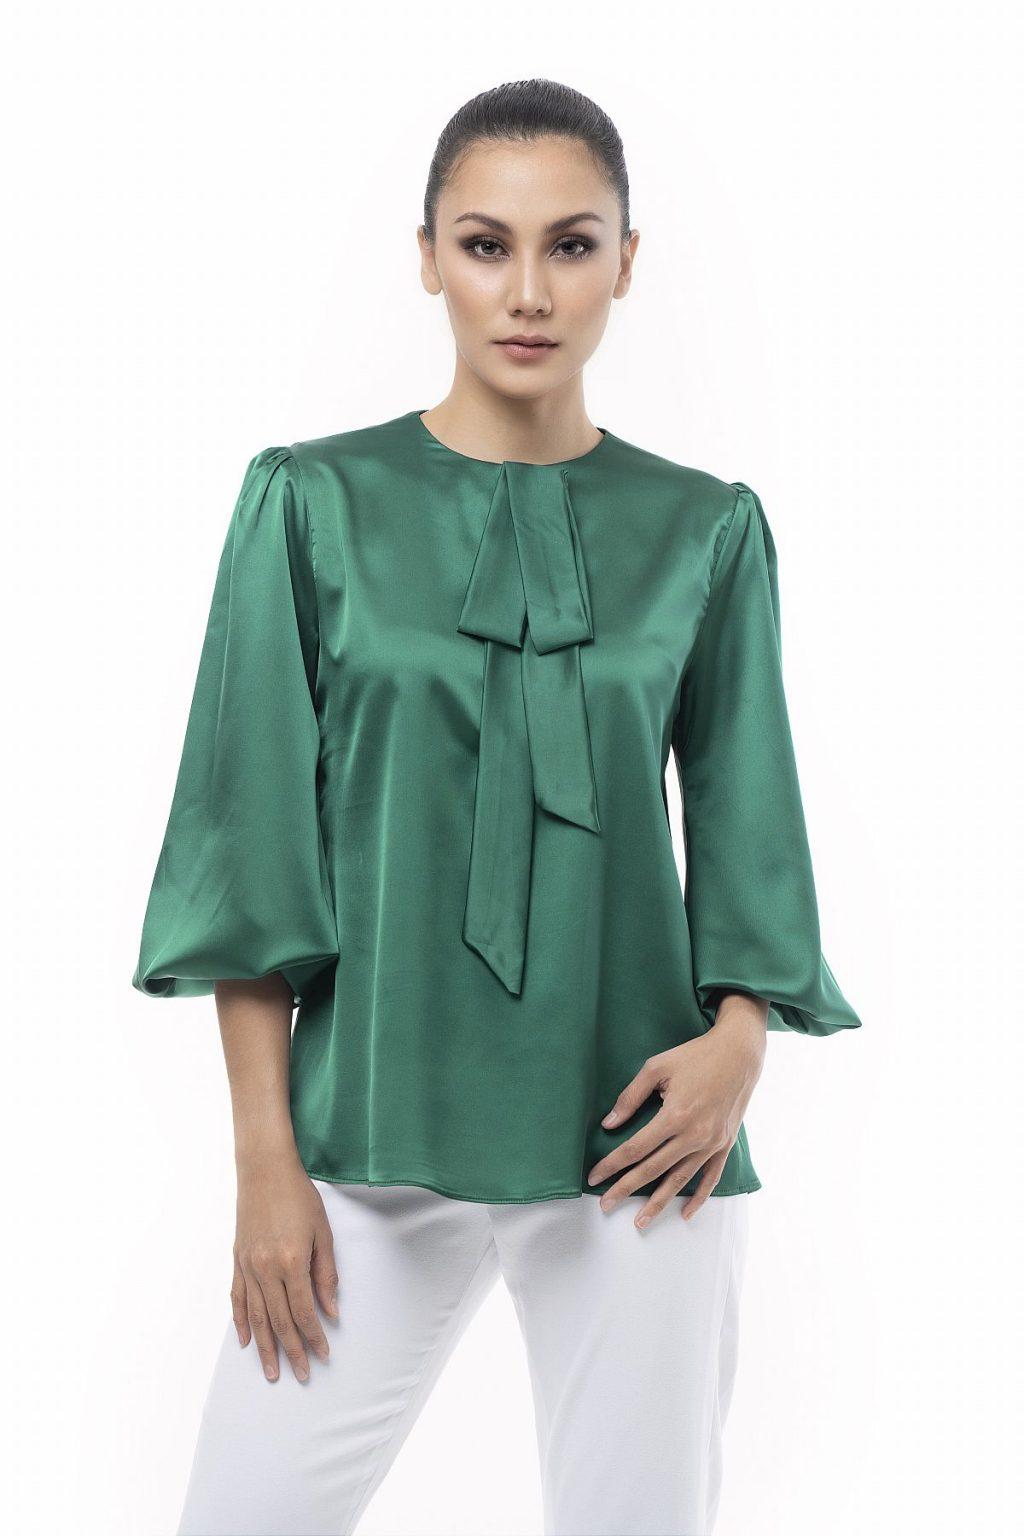 Blair in Emerald